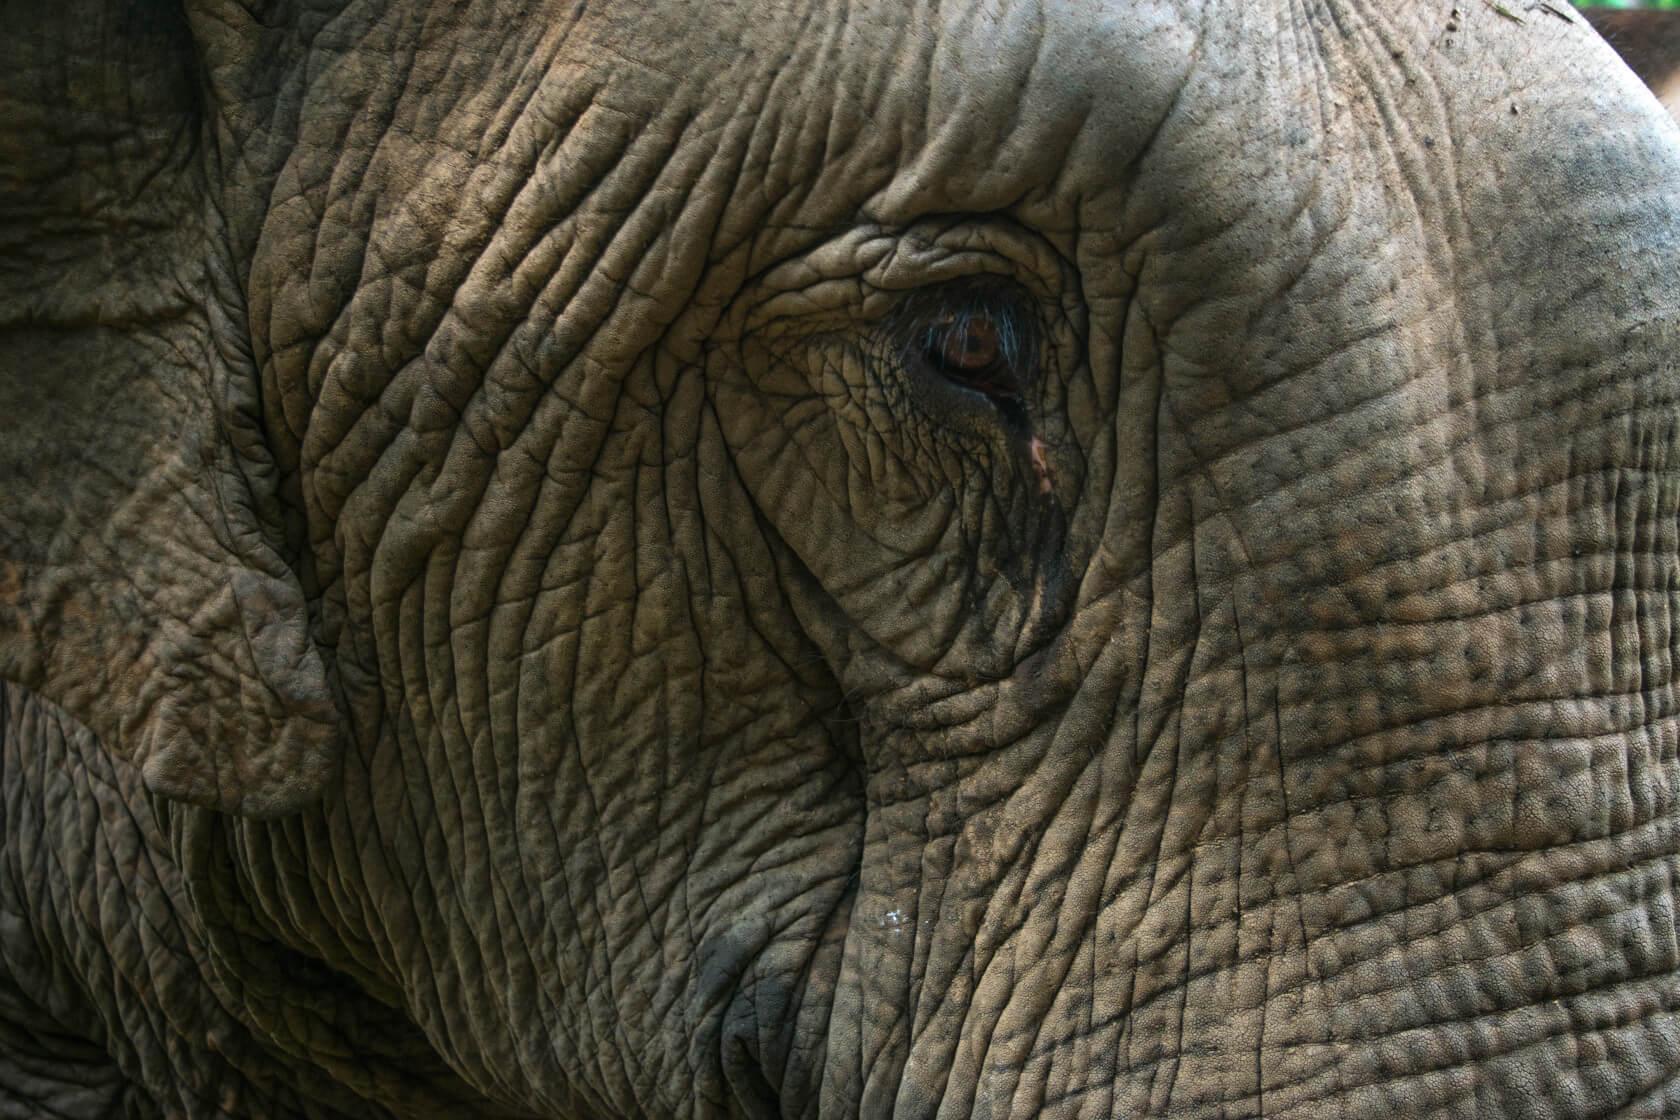 Chiang Mai elephant tour ethical thailand